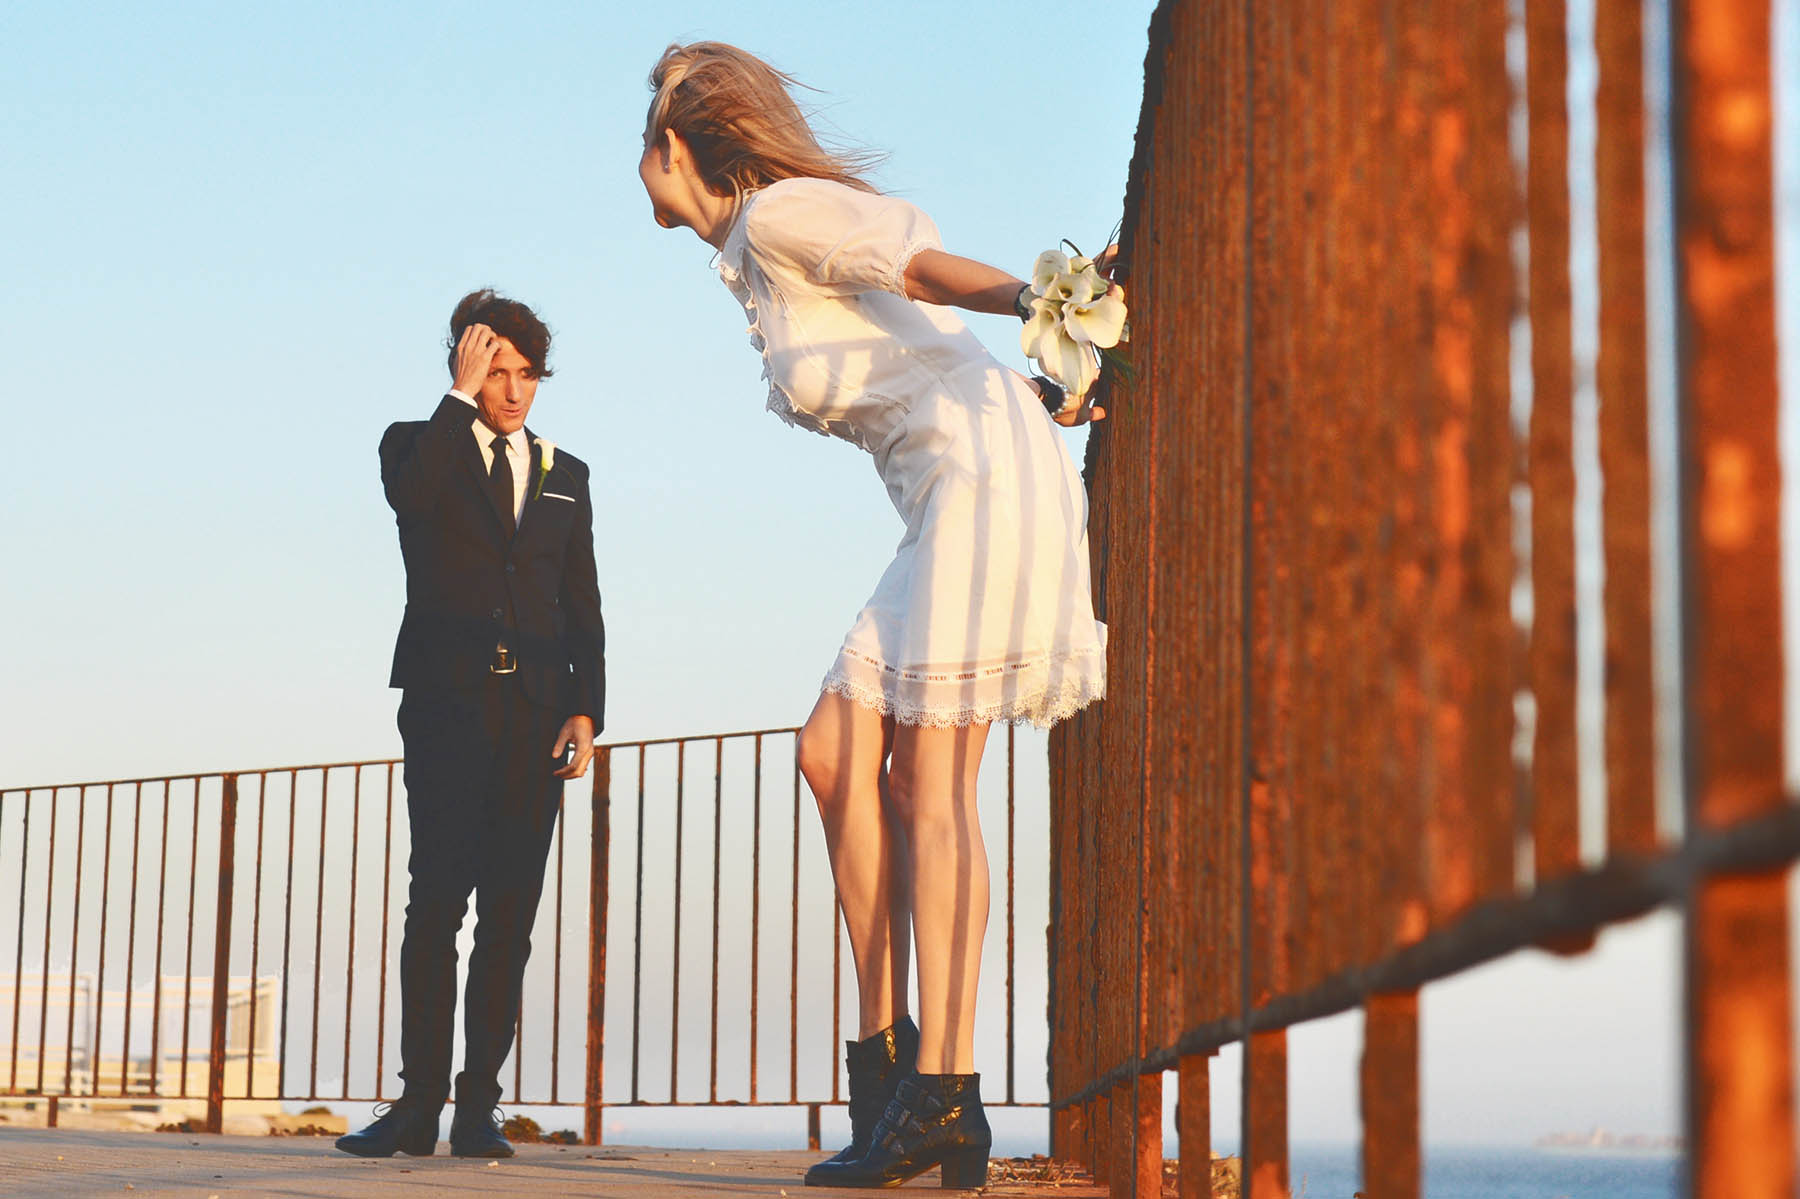 fotos divertidas bodas algeciras